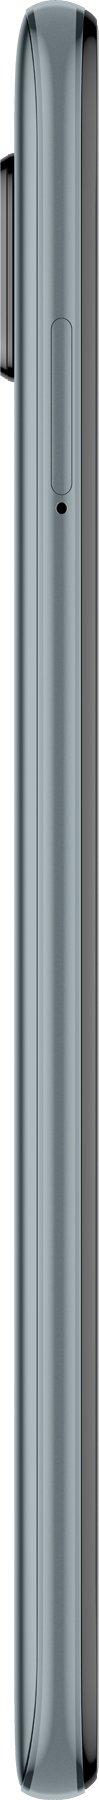 Xiaomi Redmi Note 9S 6GB/128GB grey - 5